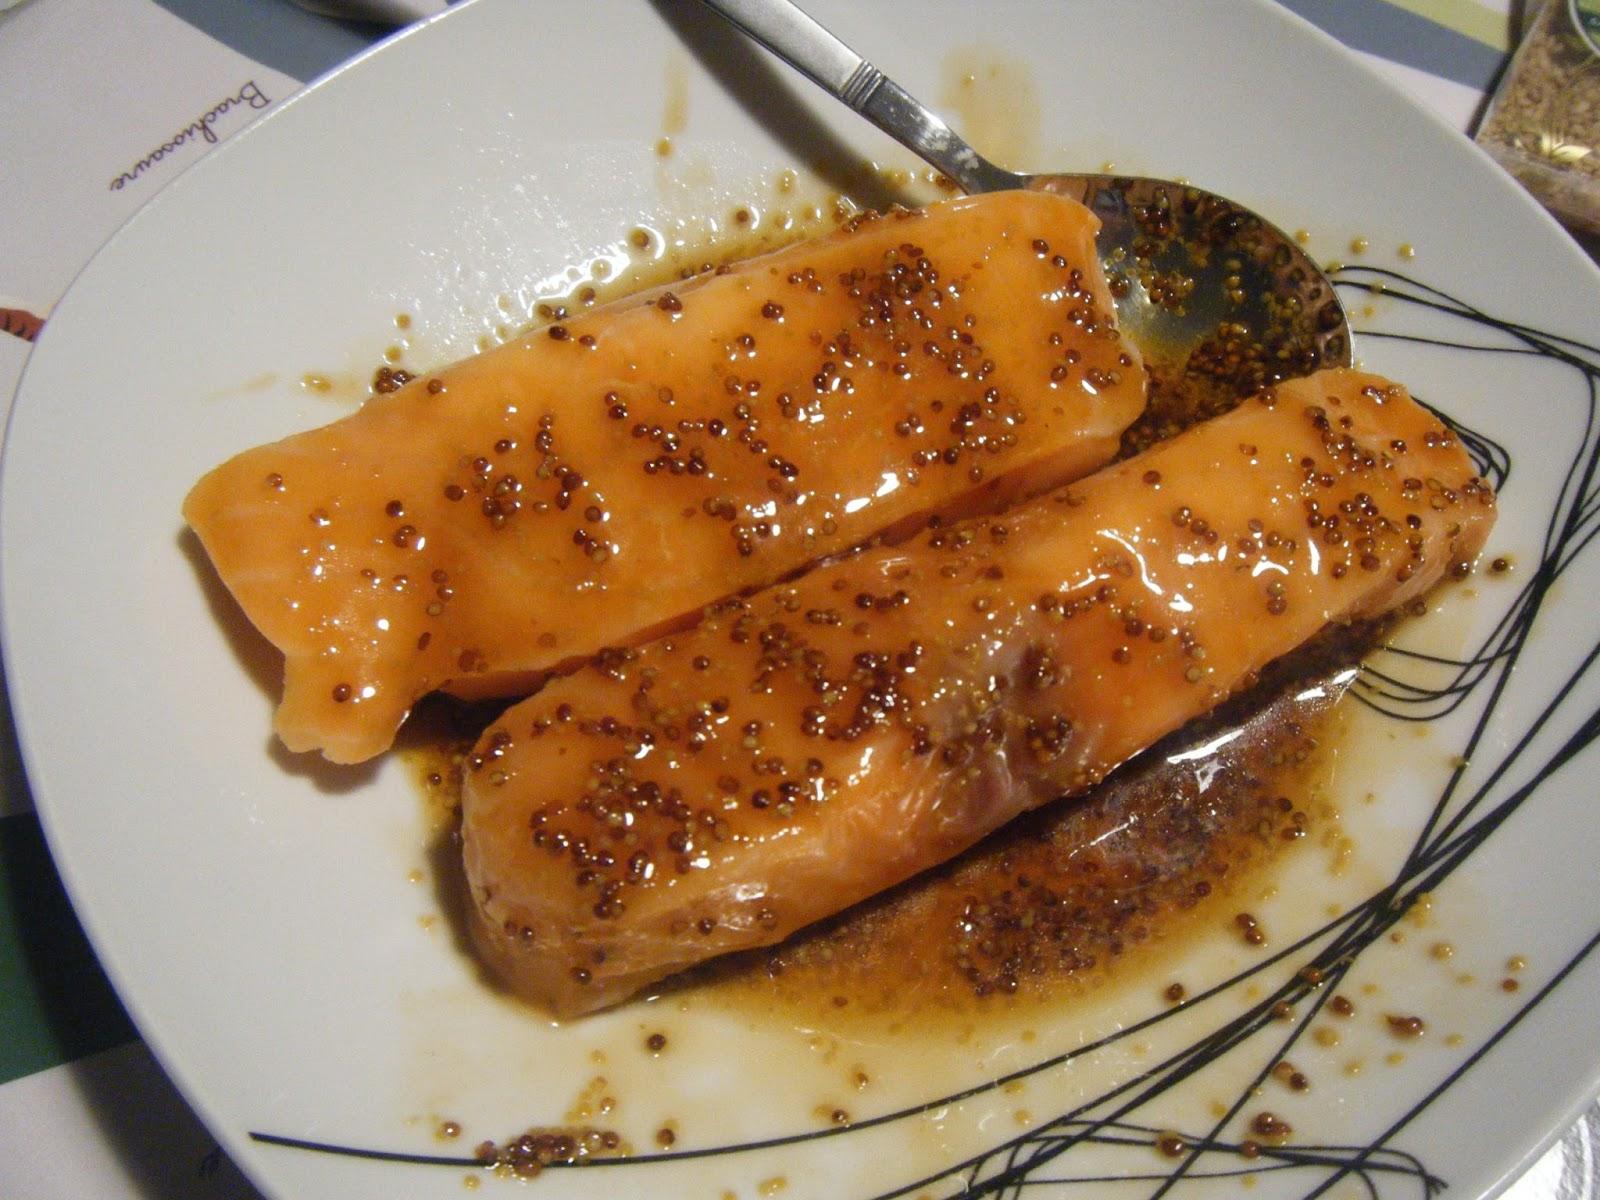 Les taratatas de sandra cuisine saumon miel soja s same for Cuisine 9269